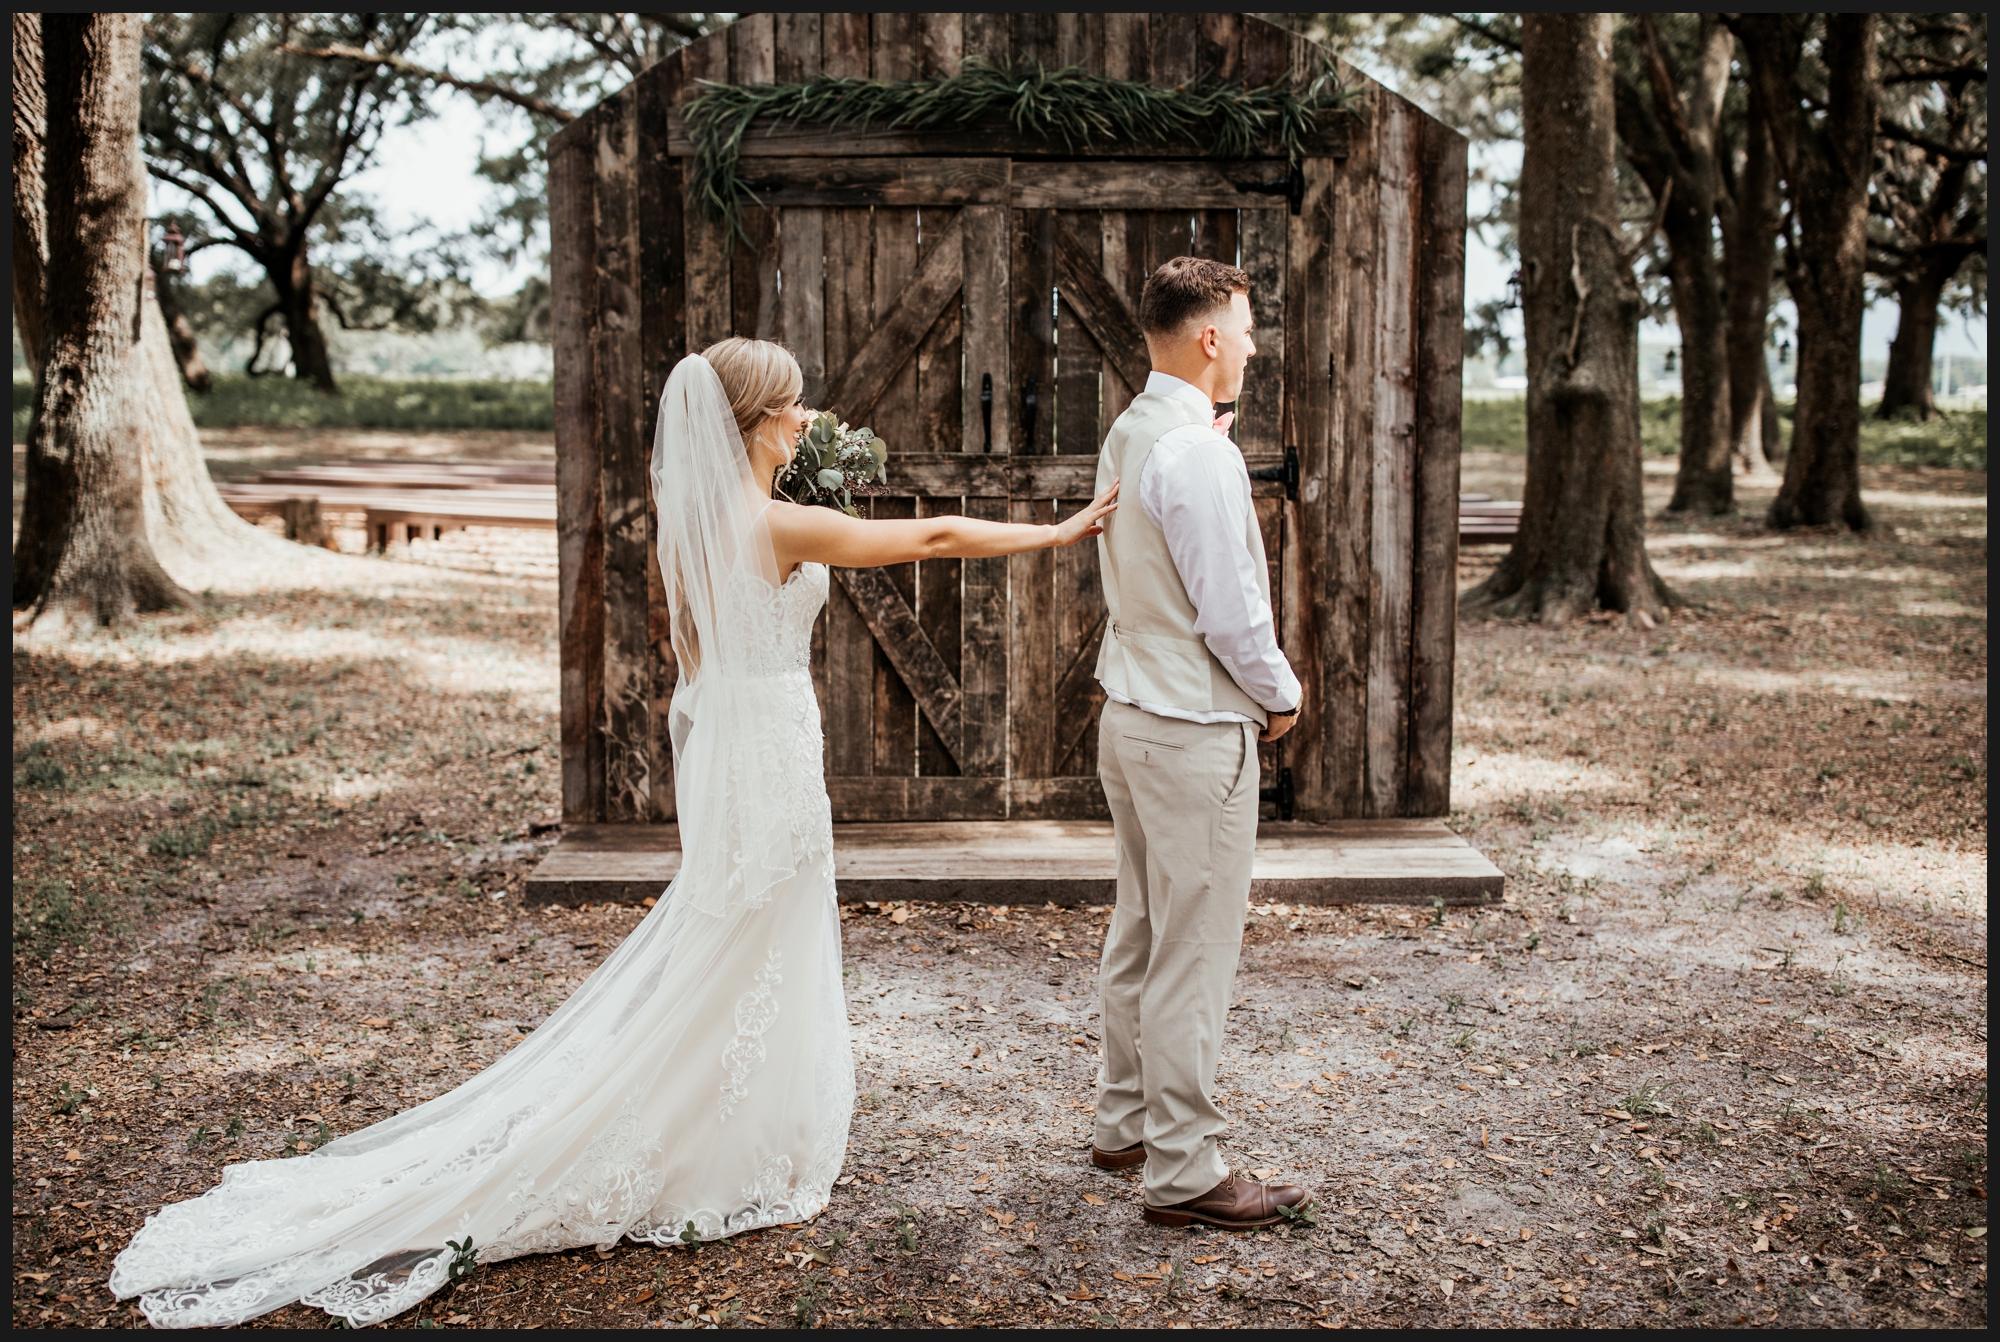 Orlando-Wedding-Photographer-destination-wedding-photographer-florida-wedding-photographer-hawaii-wedding-photographer_0292.jpg